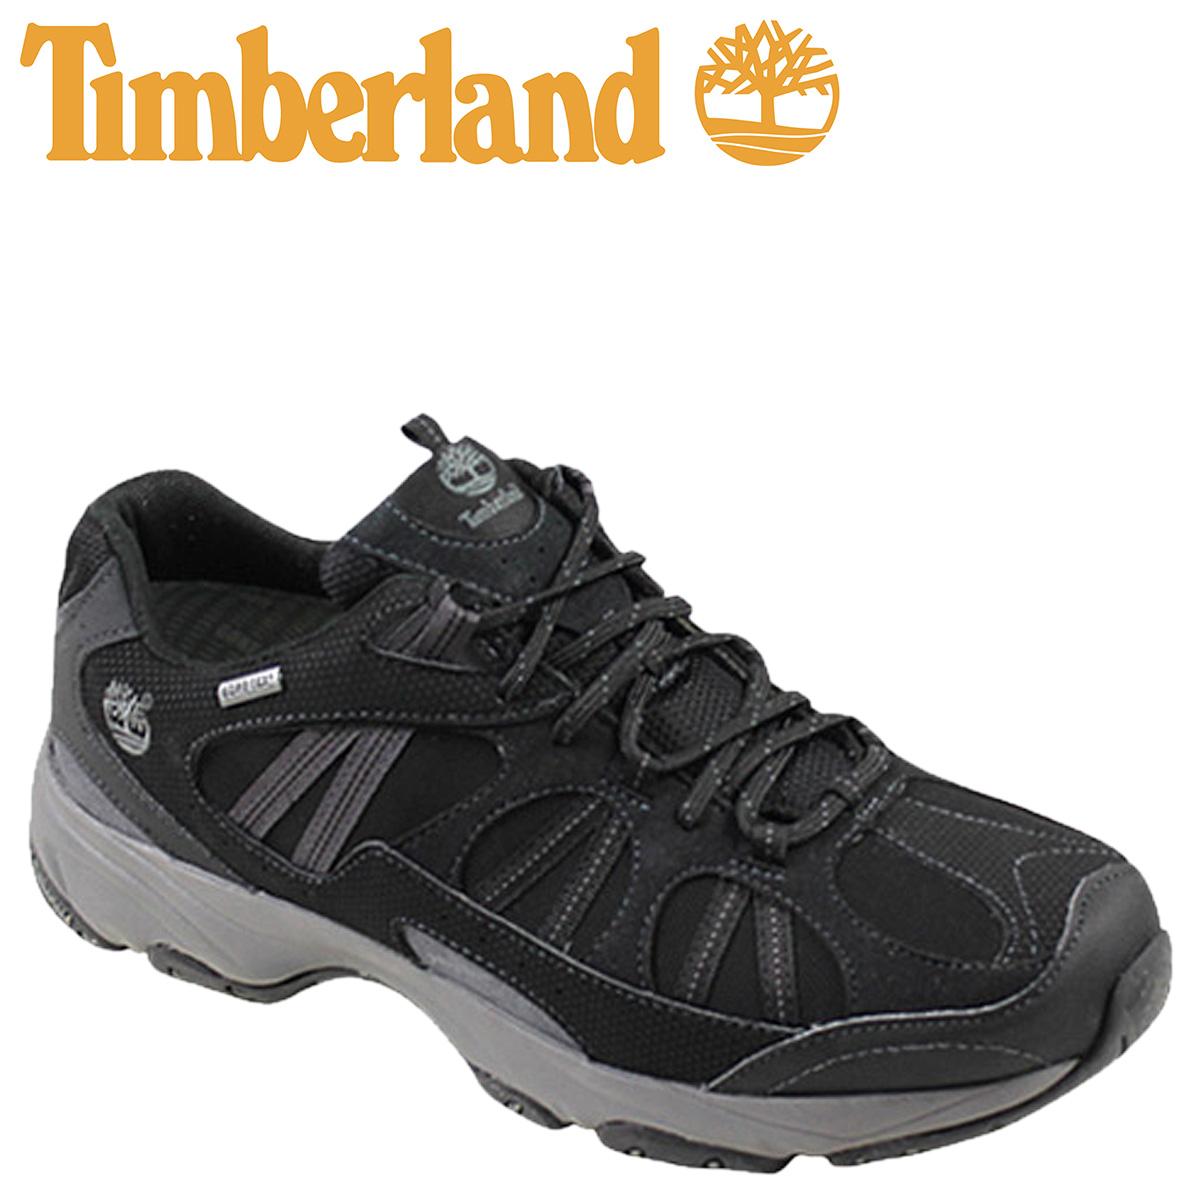 Gore Tex Trance Low Translite Men Black Timberland Light 94106 Sneakers rBdCxoWQe